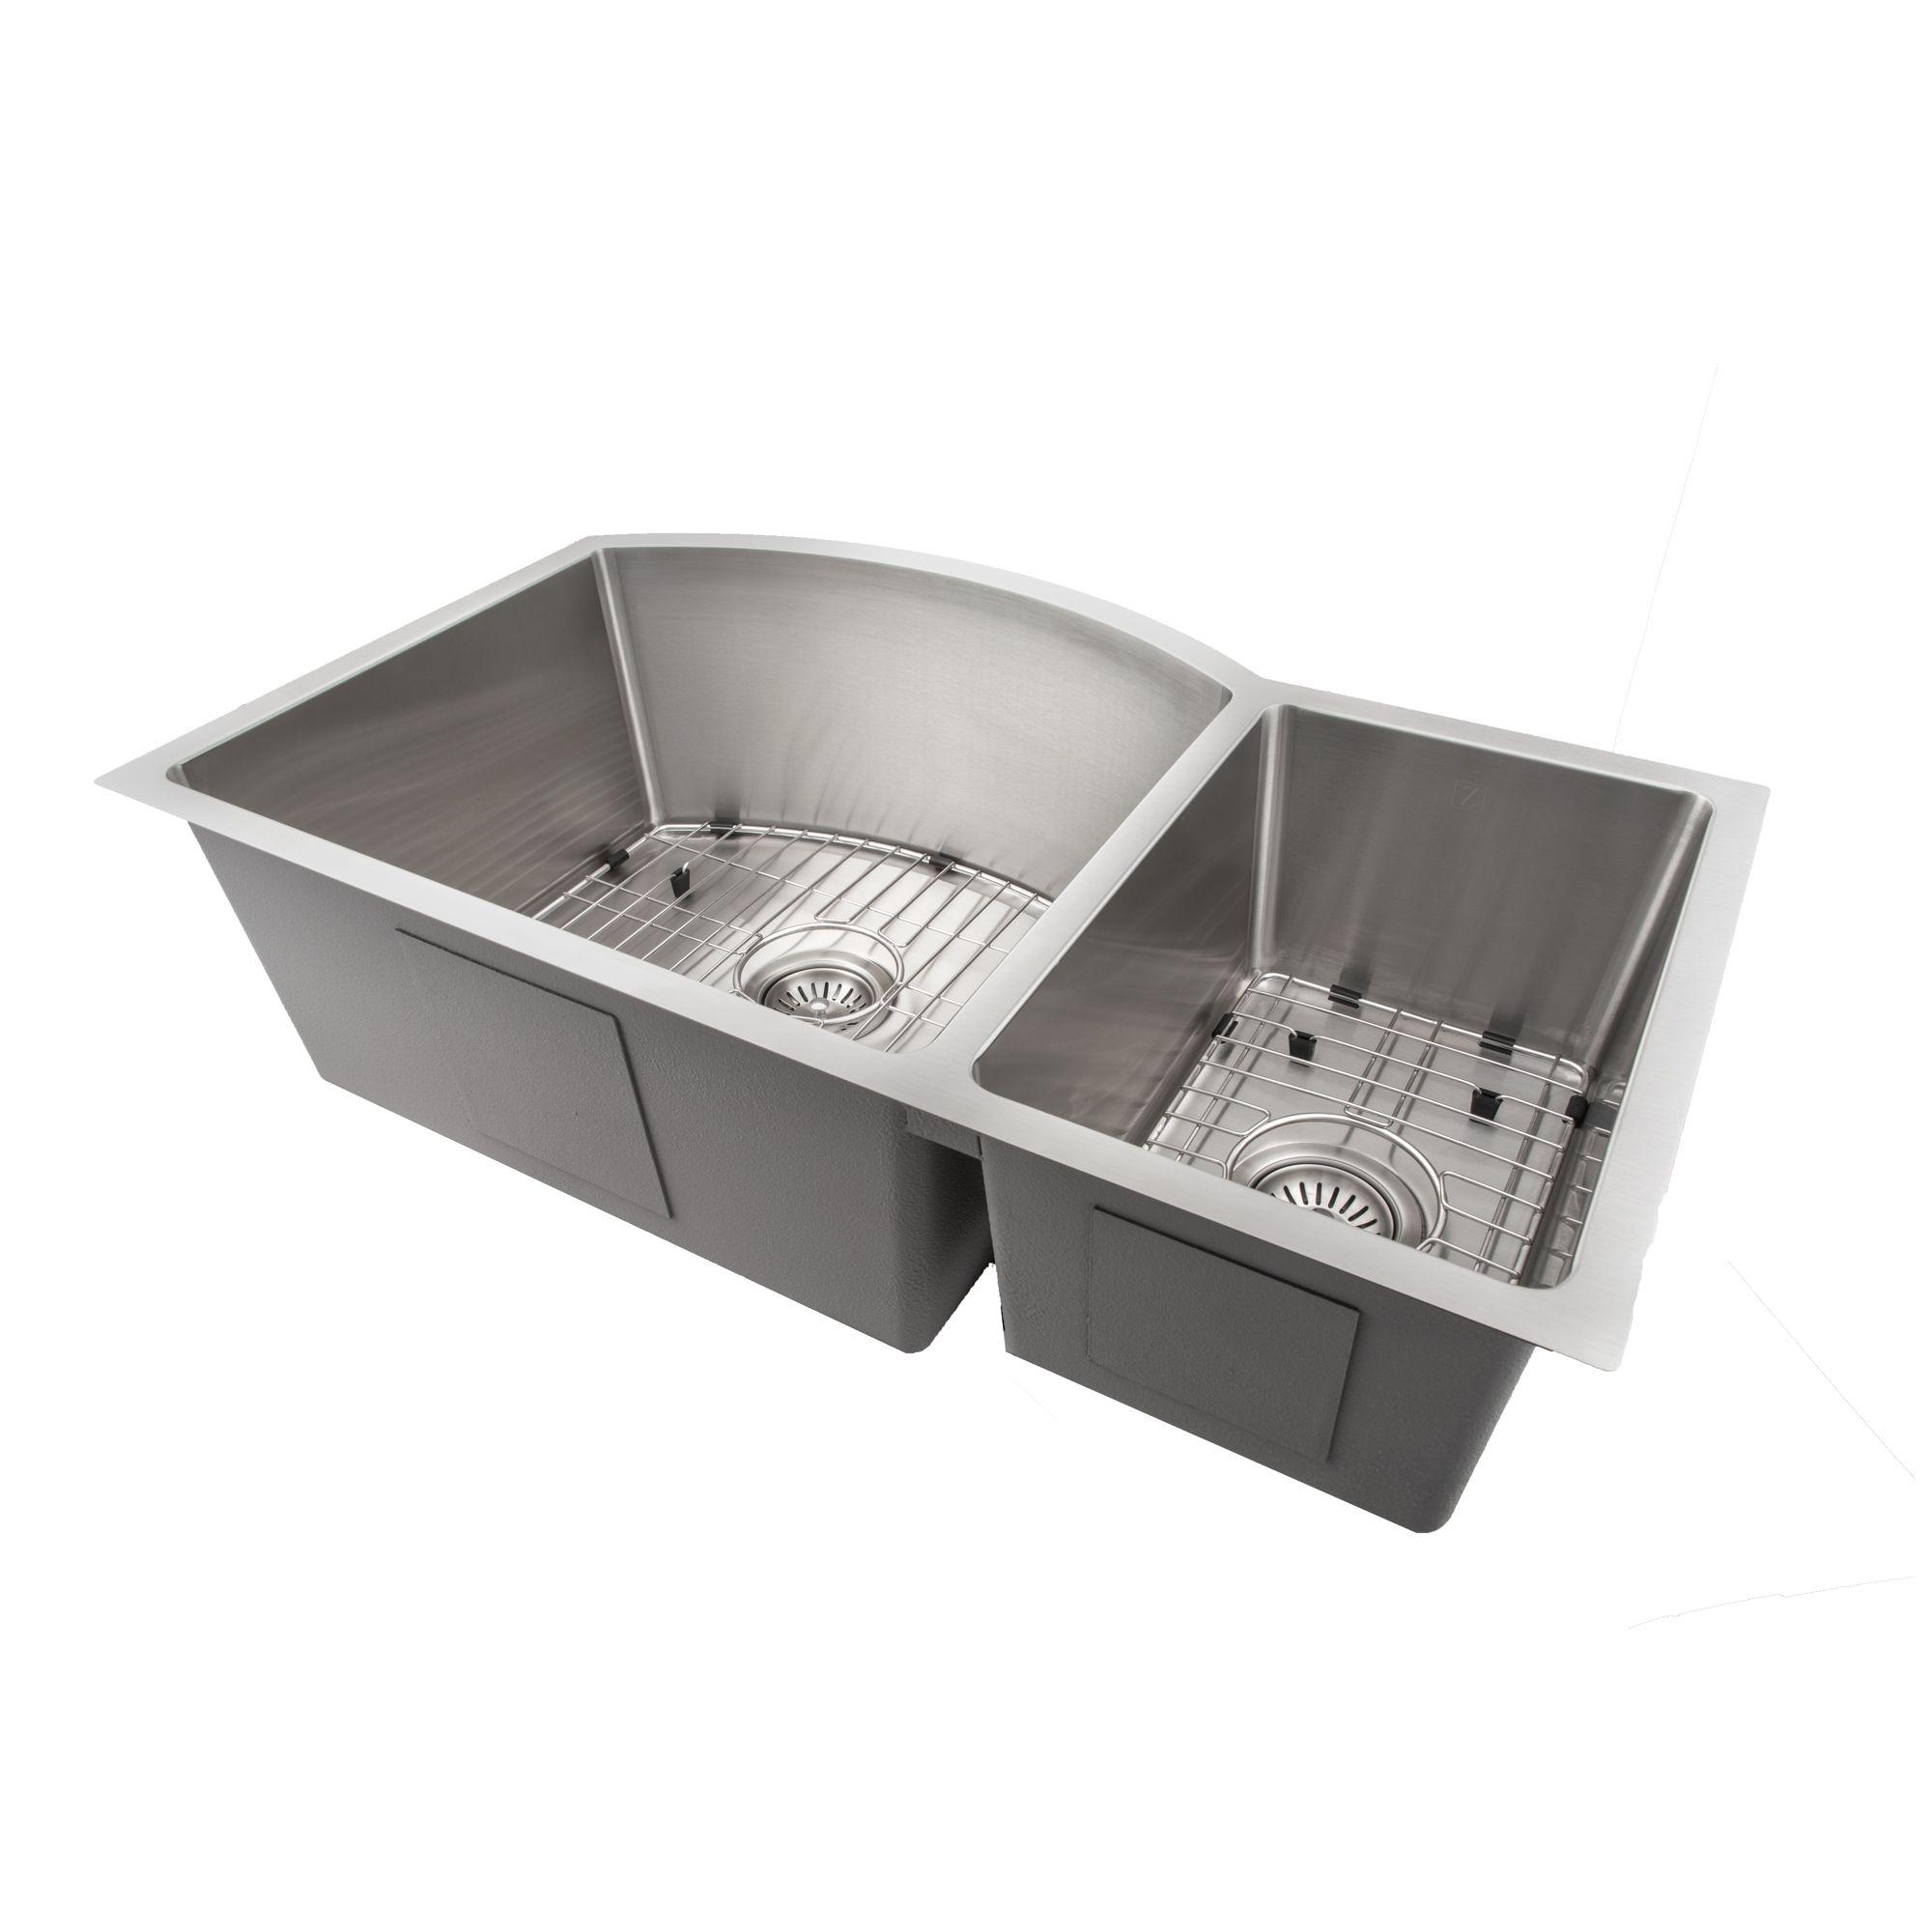 Zline Gateway Series 33 Inch Undermount Double Bowl Sink In Stainless Steel Sc70d 33 Double Bowl Sink Sink Stainless Steel Range Hood